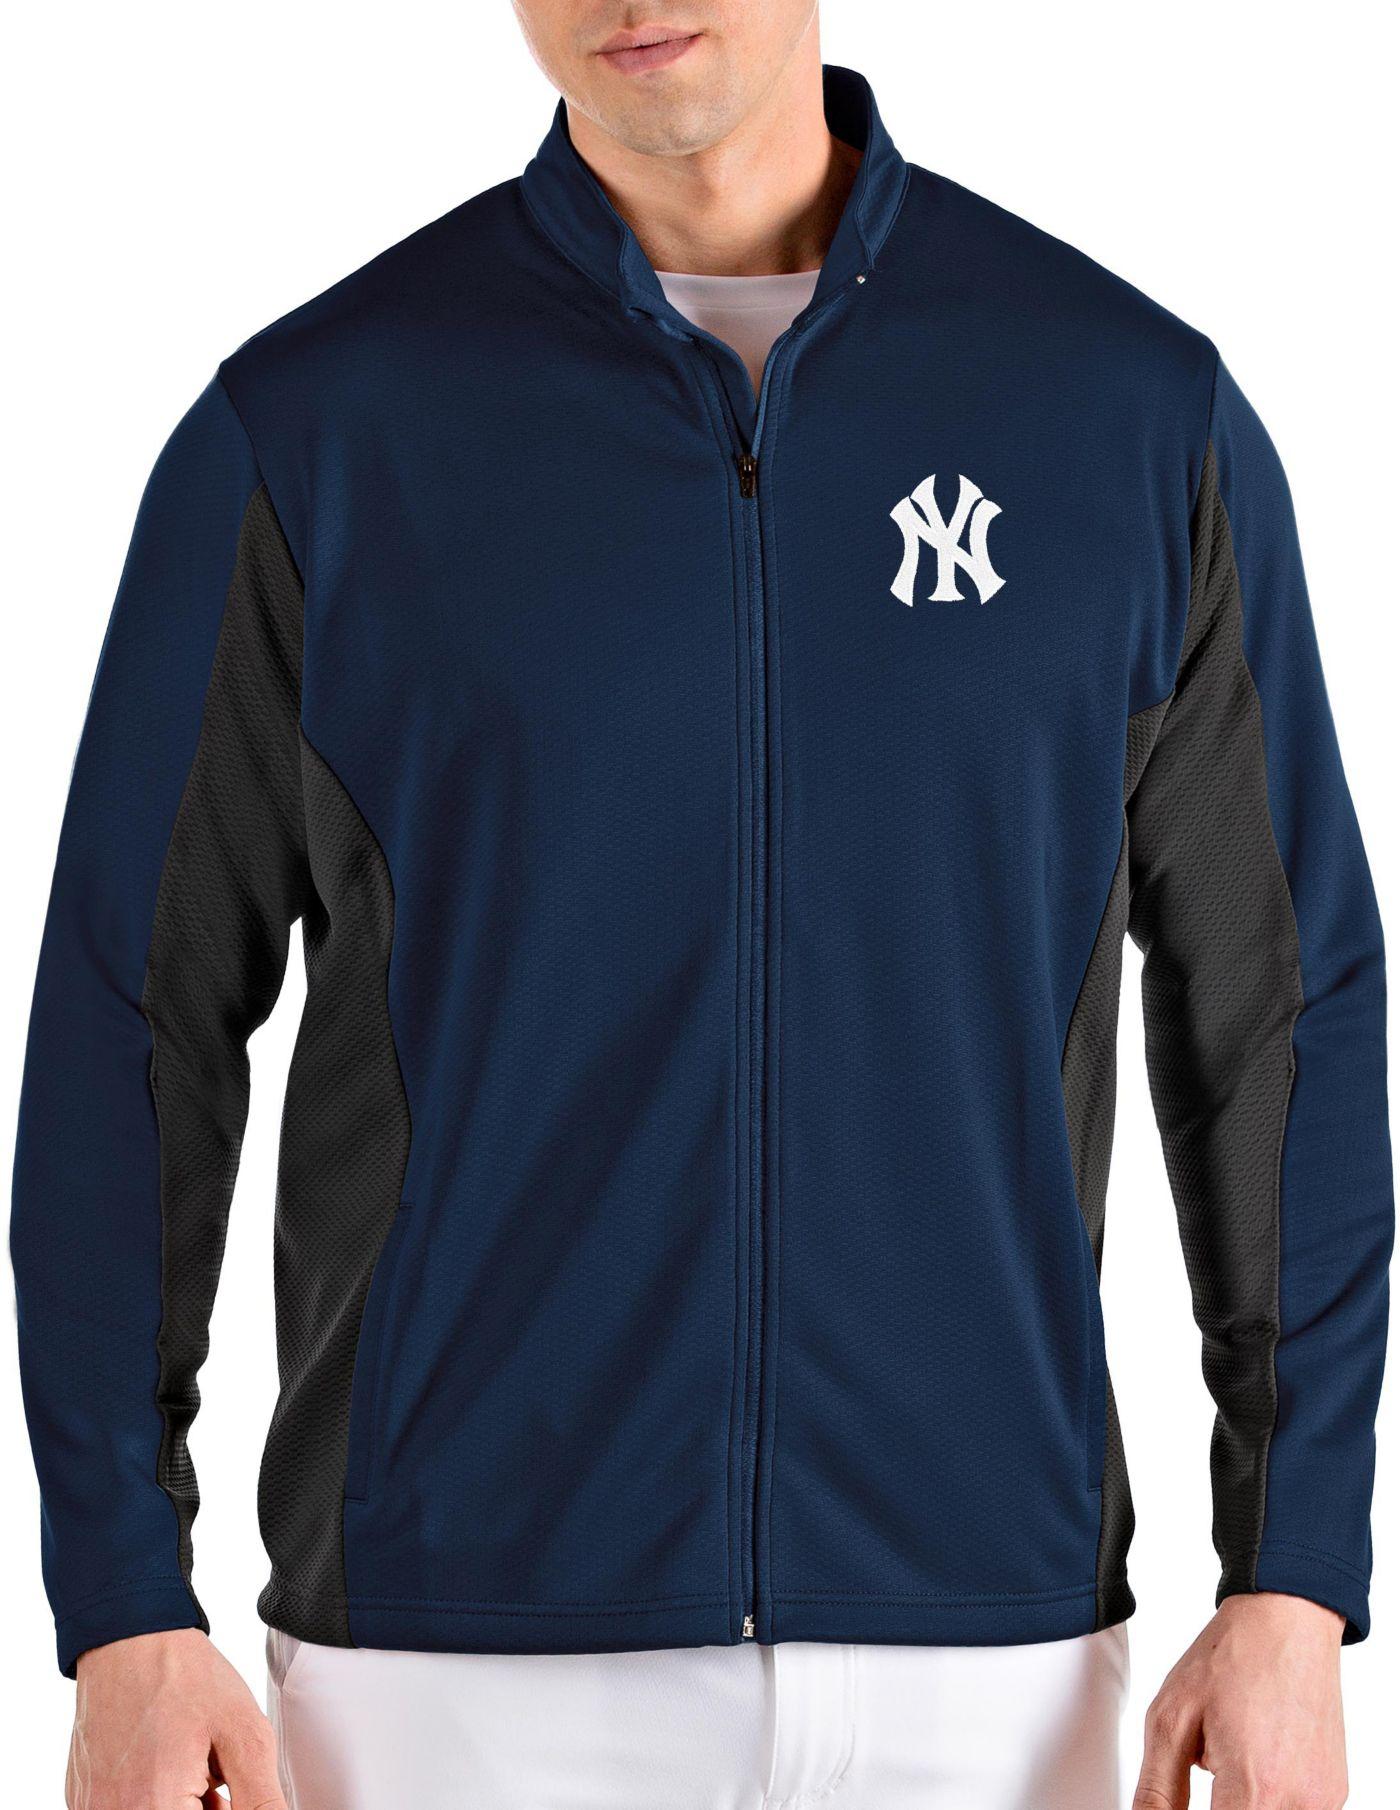 Antigua Men's New York Yankees Navy Passage Full-Zip Jacket